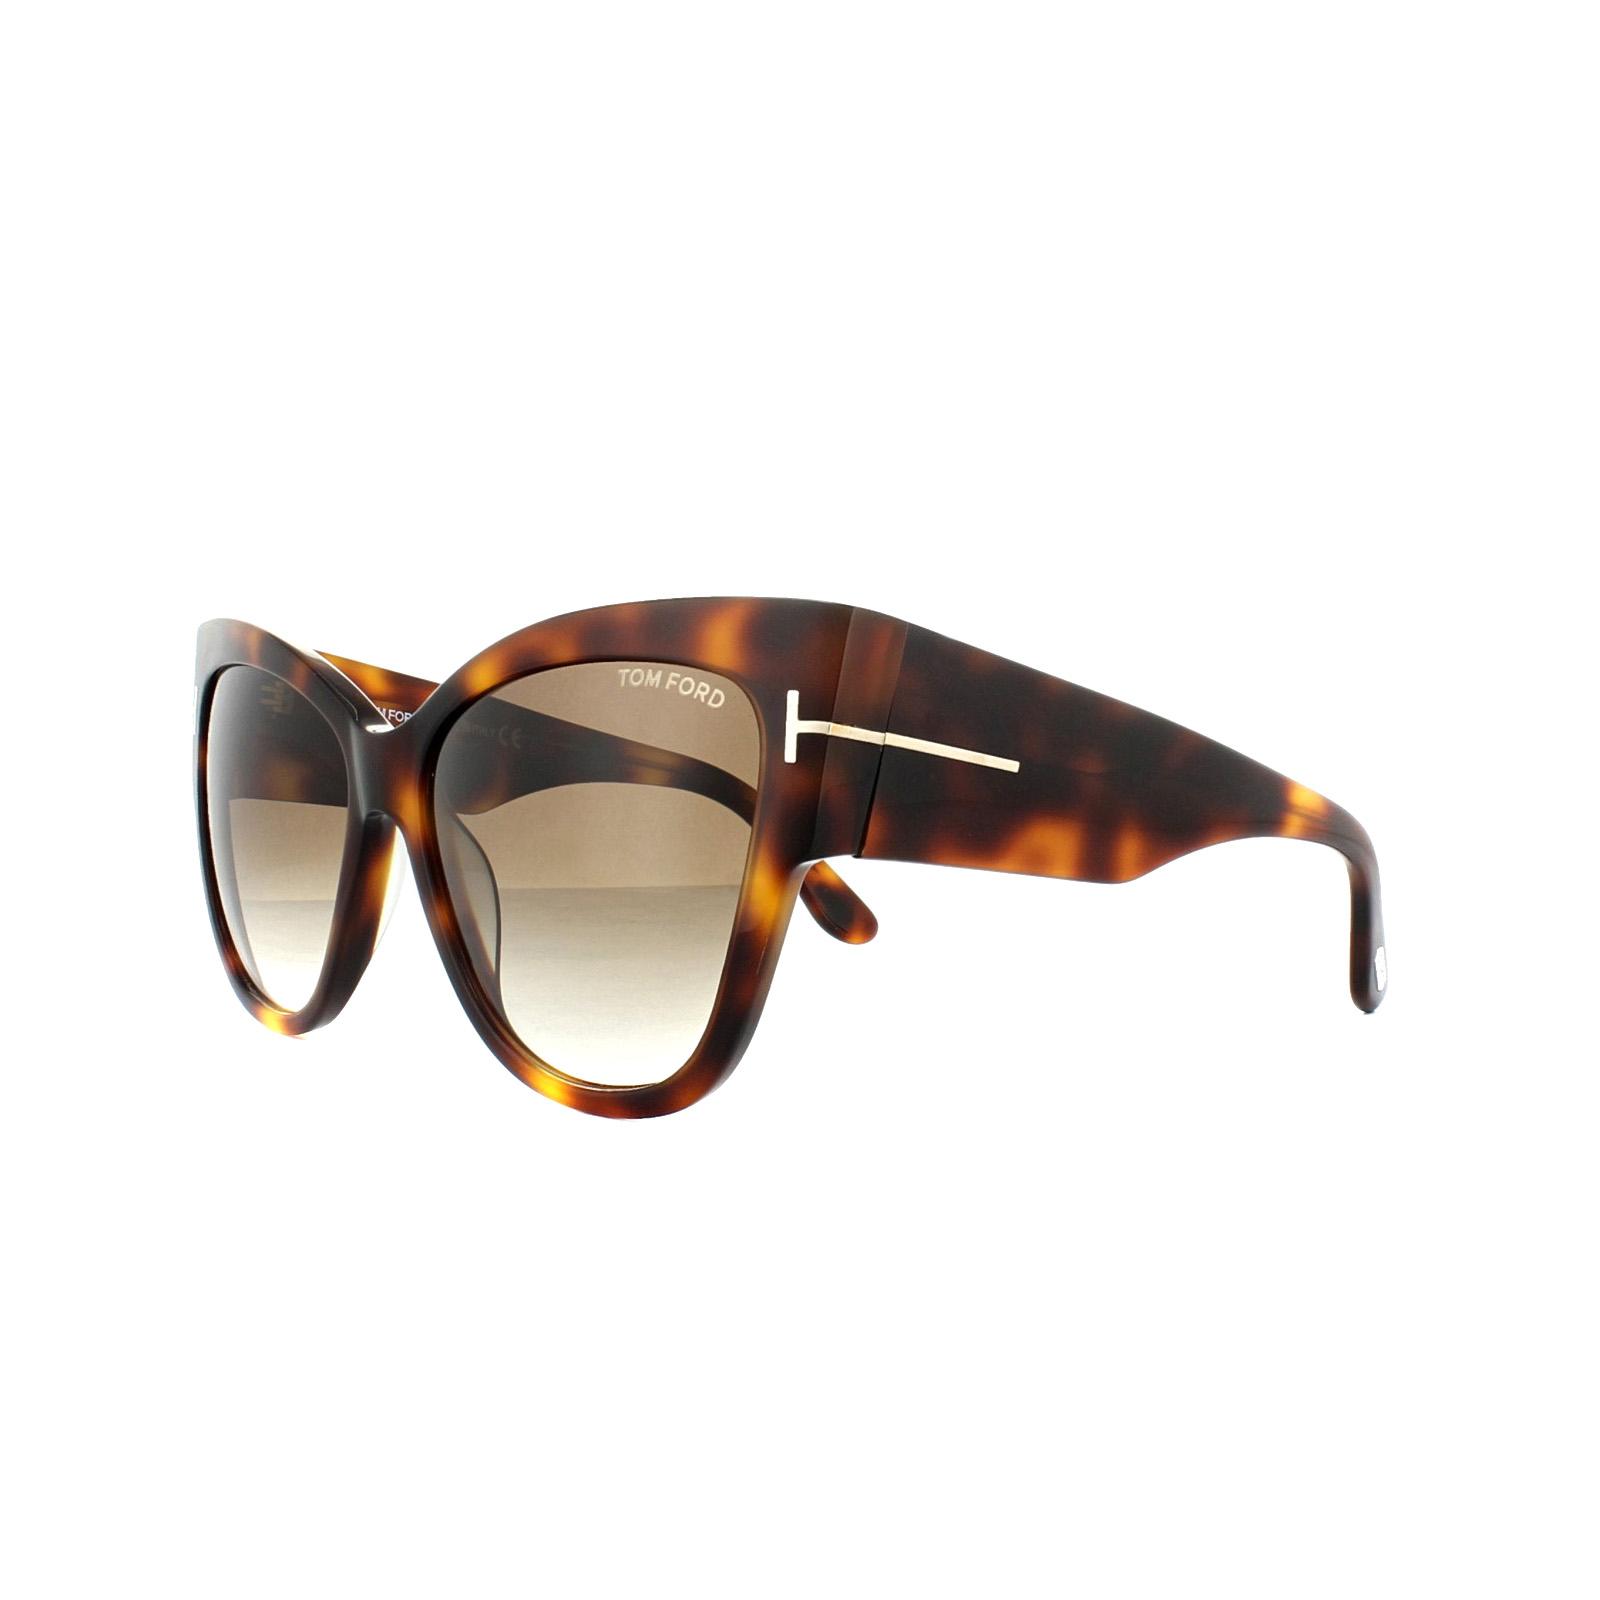 39236d66c6 Sentinel Tom Ford Sunglasses 0371 Anoushka 53F Blonde Havana Brown Gradient